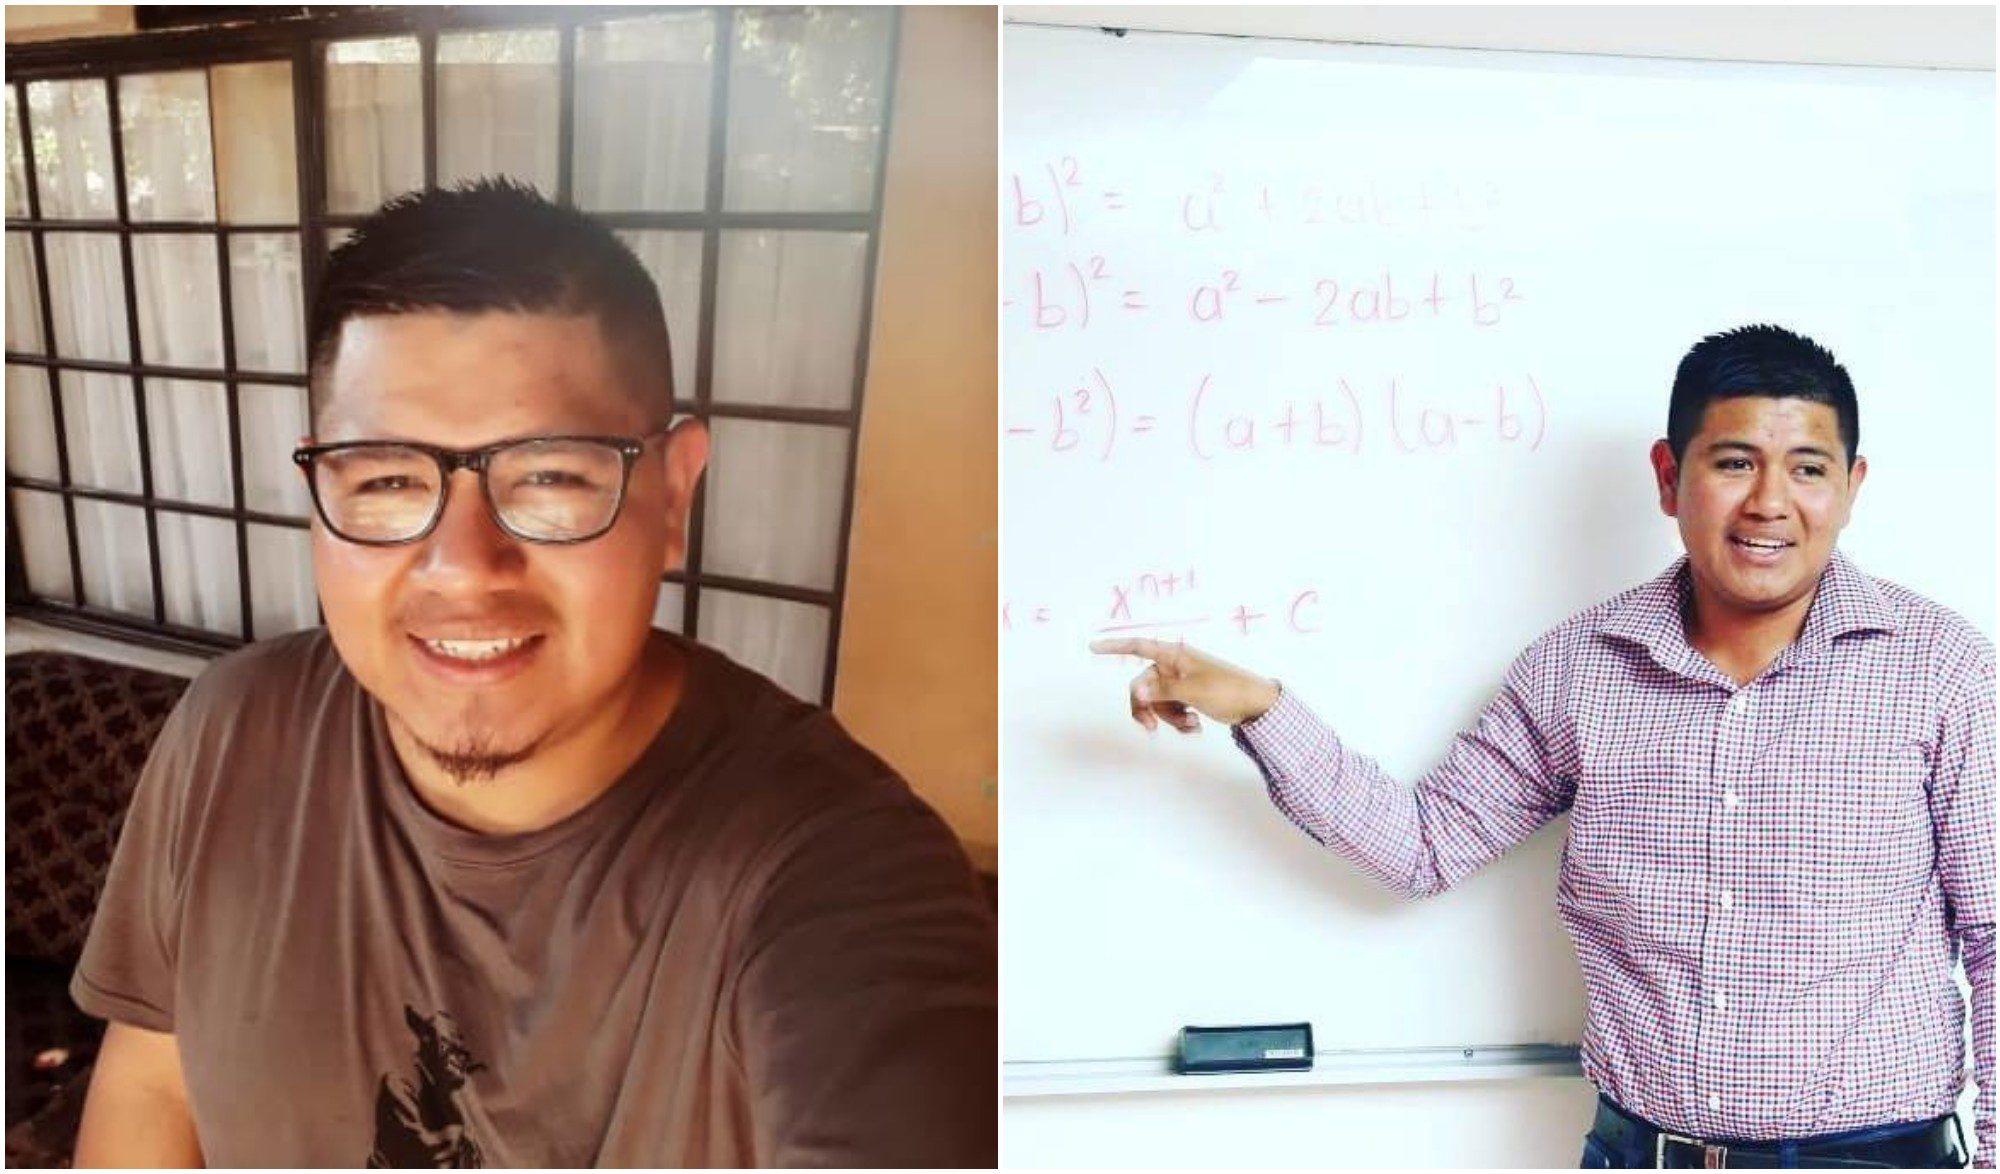 Hondureño forma parte de Google Developer Student Club